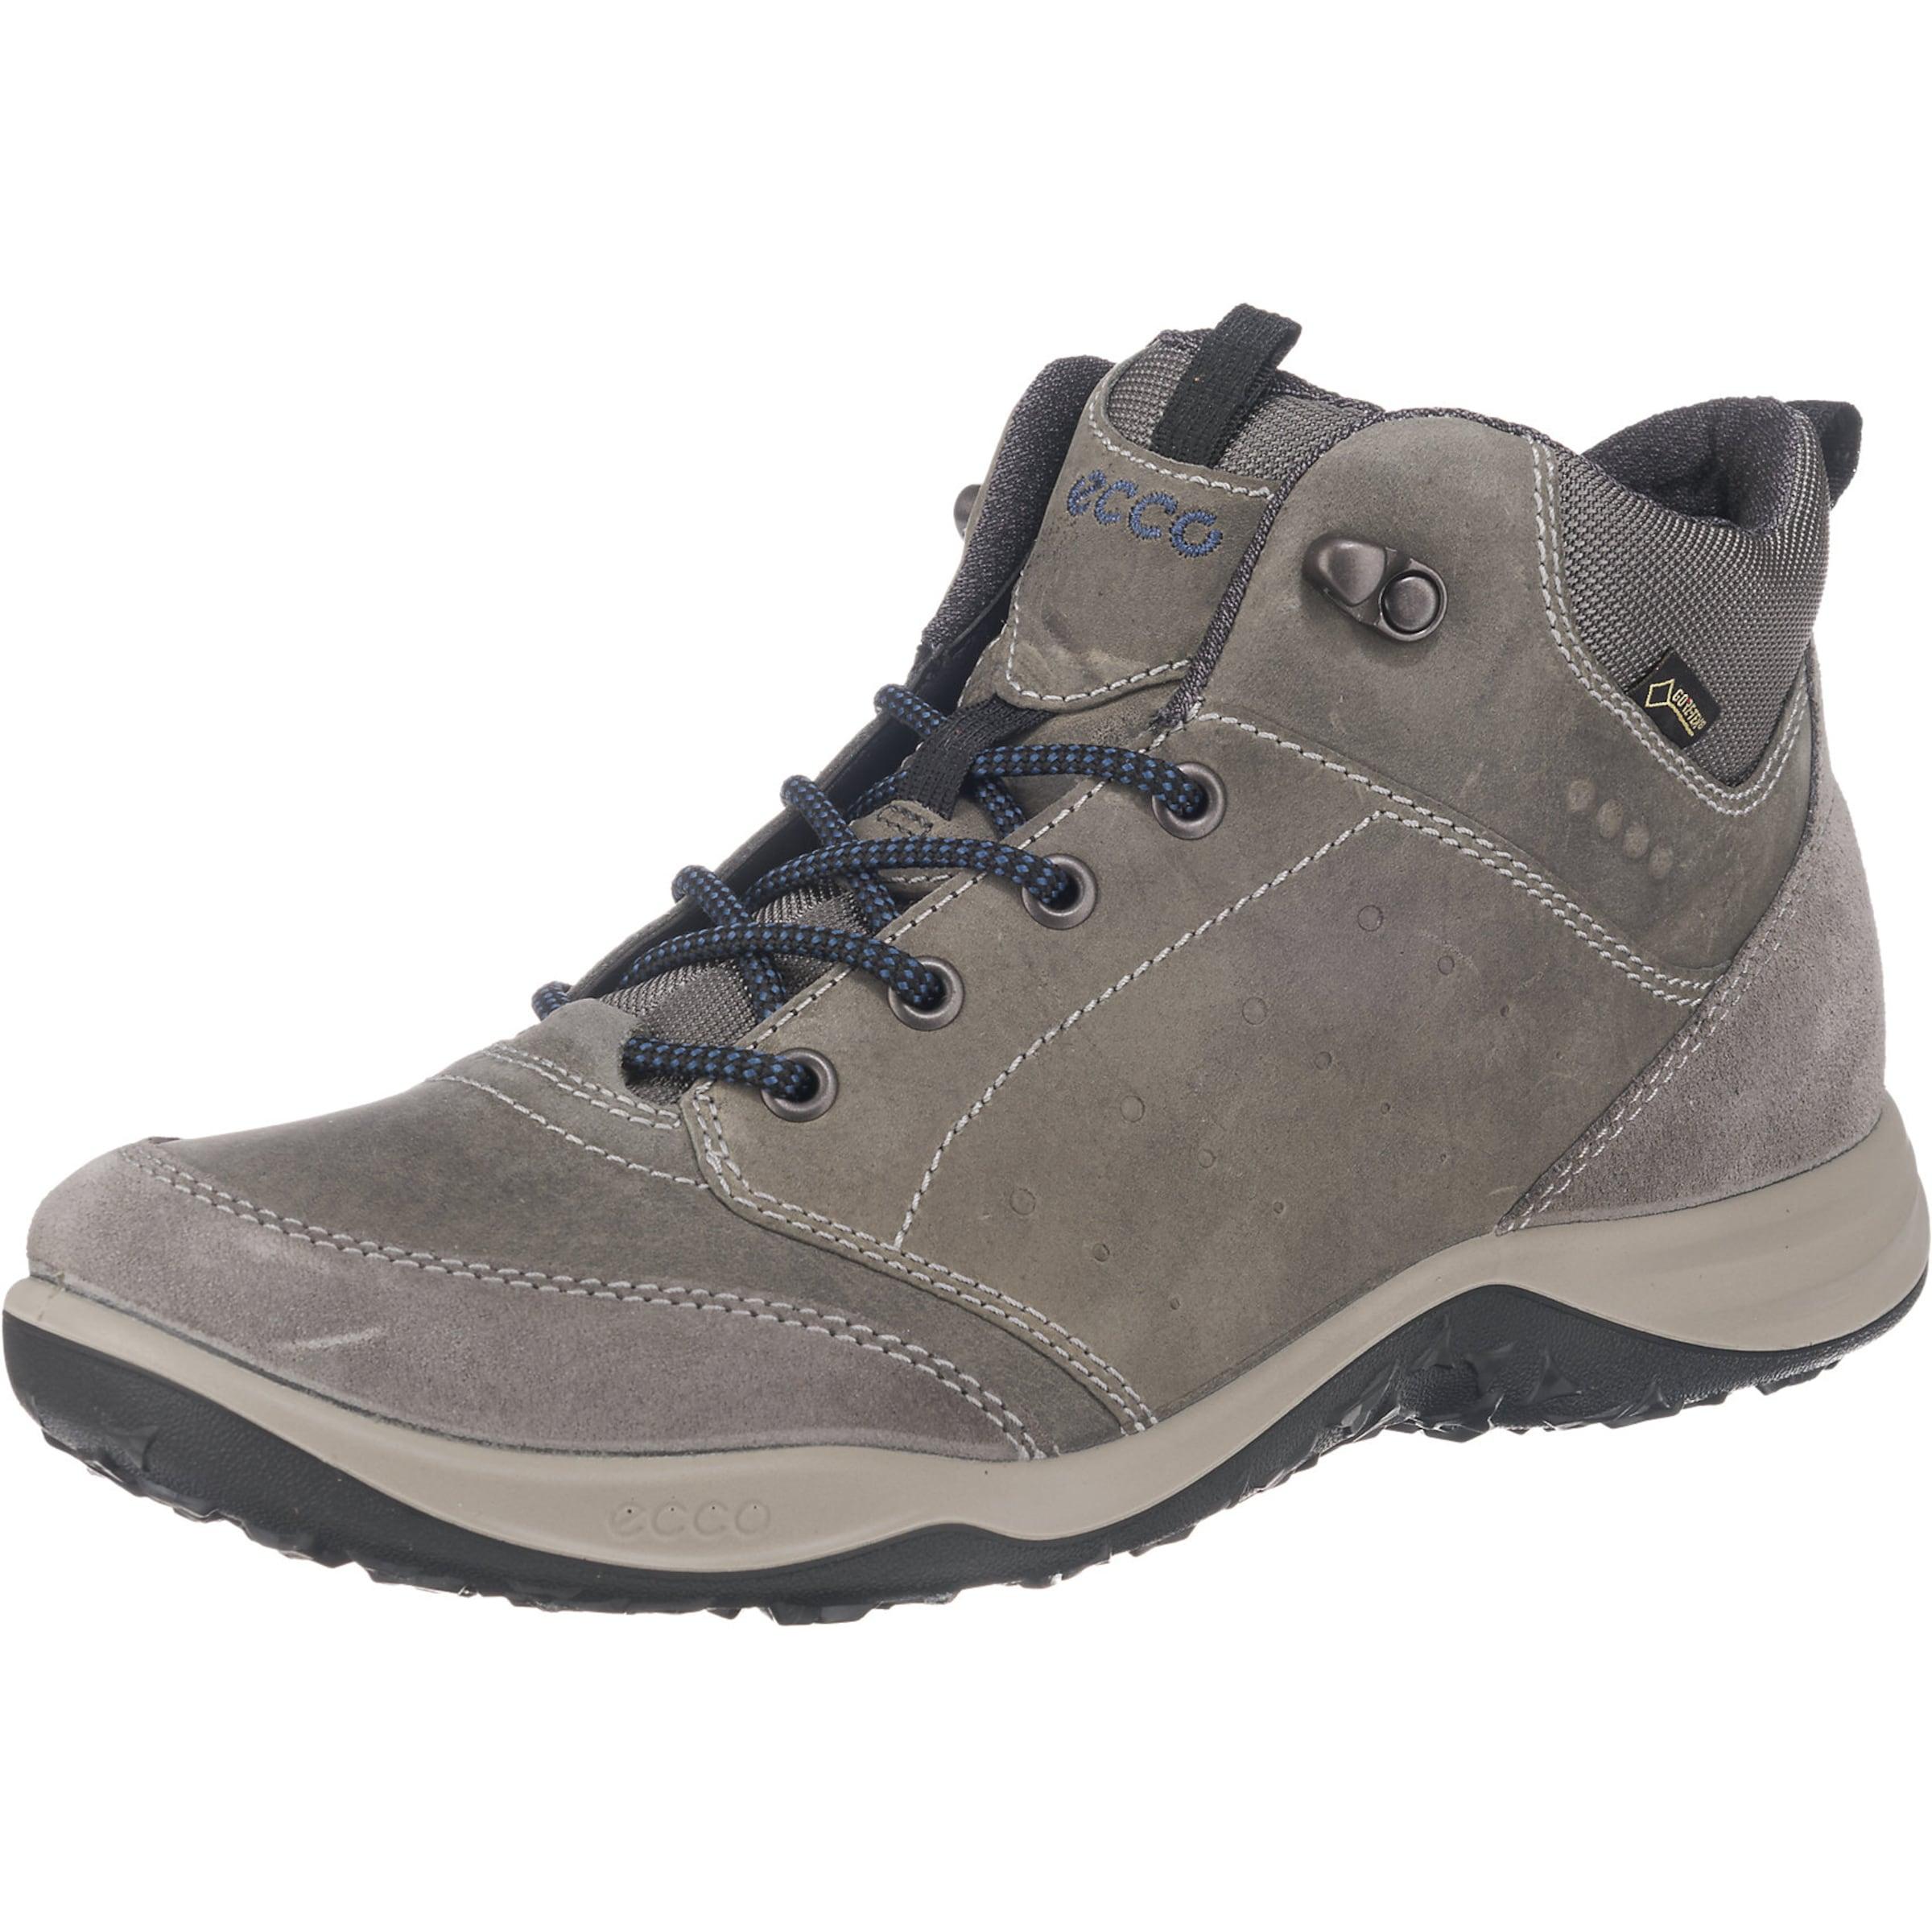 ECCO | Espinho Stiefel & Schuhe Stiefeletten Schuhe Gut getragene Schuhe & fccaba